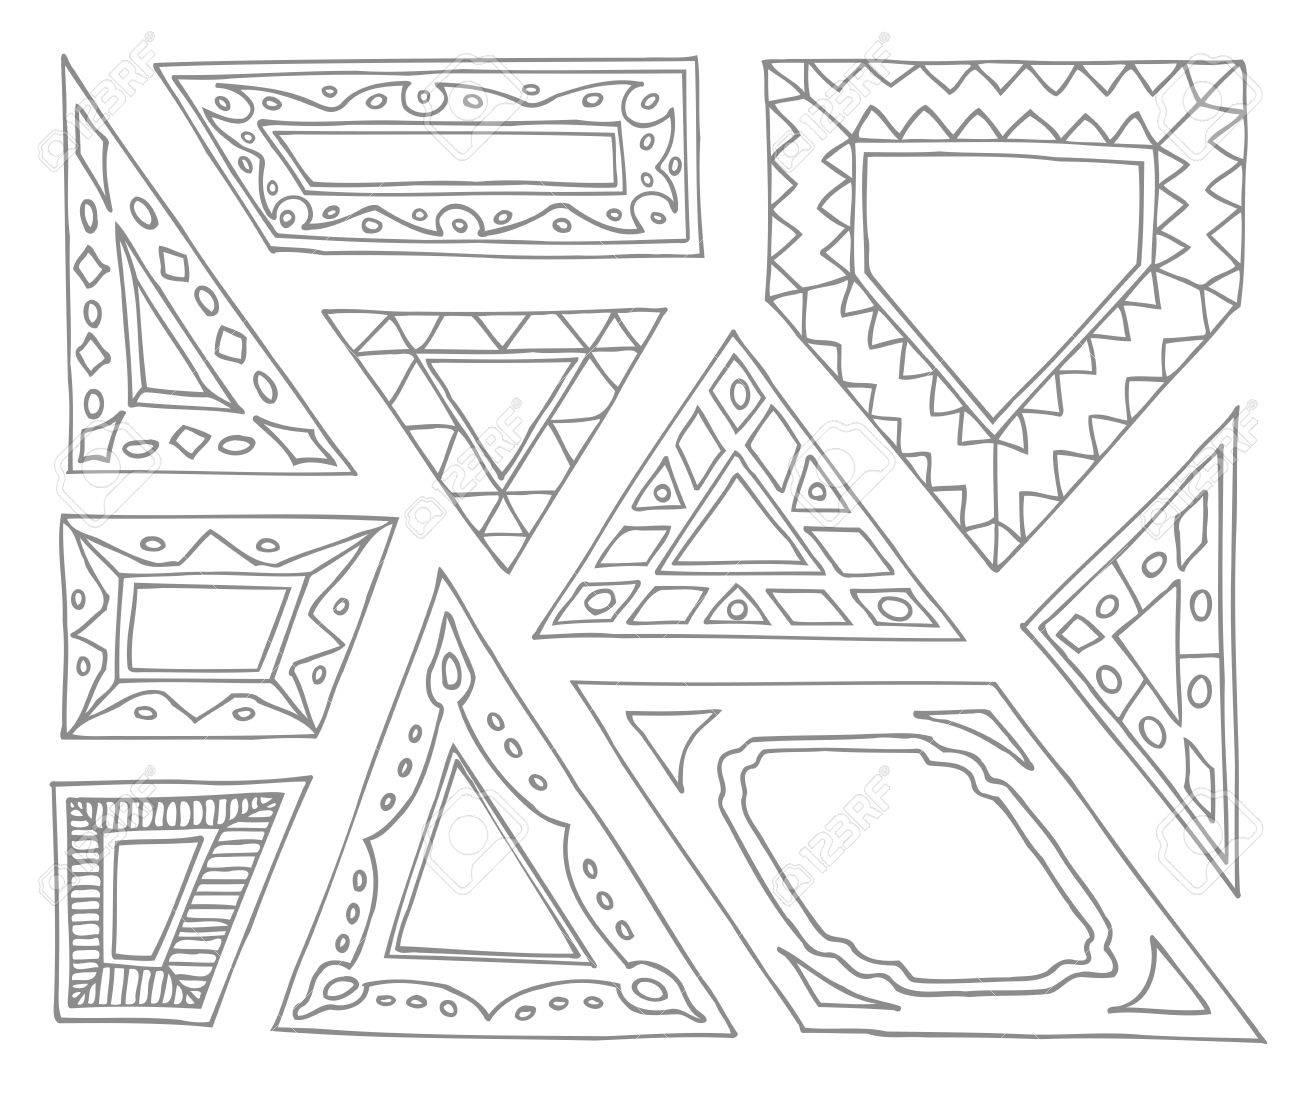 Set of hand drawn picture frames triangular parallelogram set of hand drawn picture frames triangular parallelogram quadrilateral pentagon unusual jeuxipadfo Images